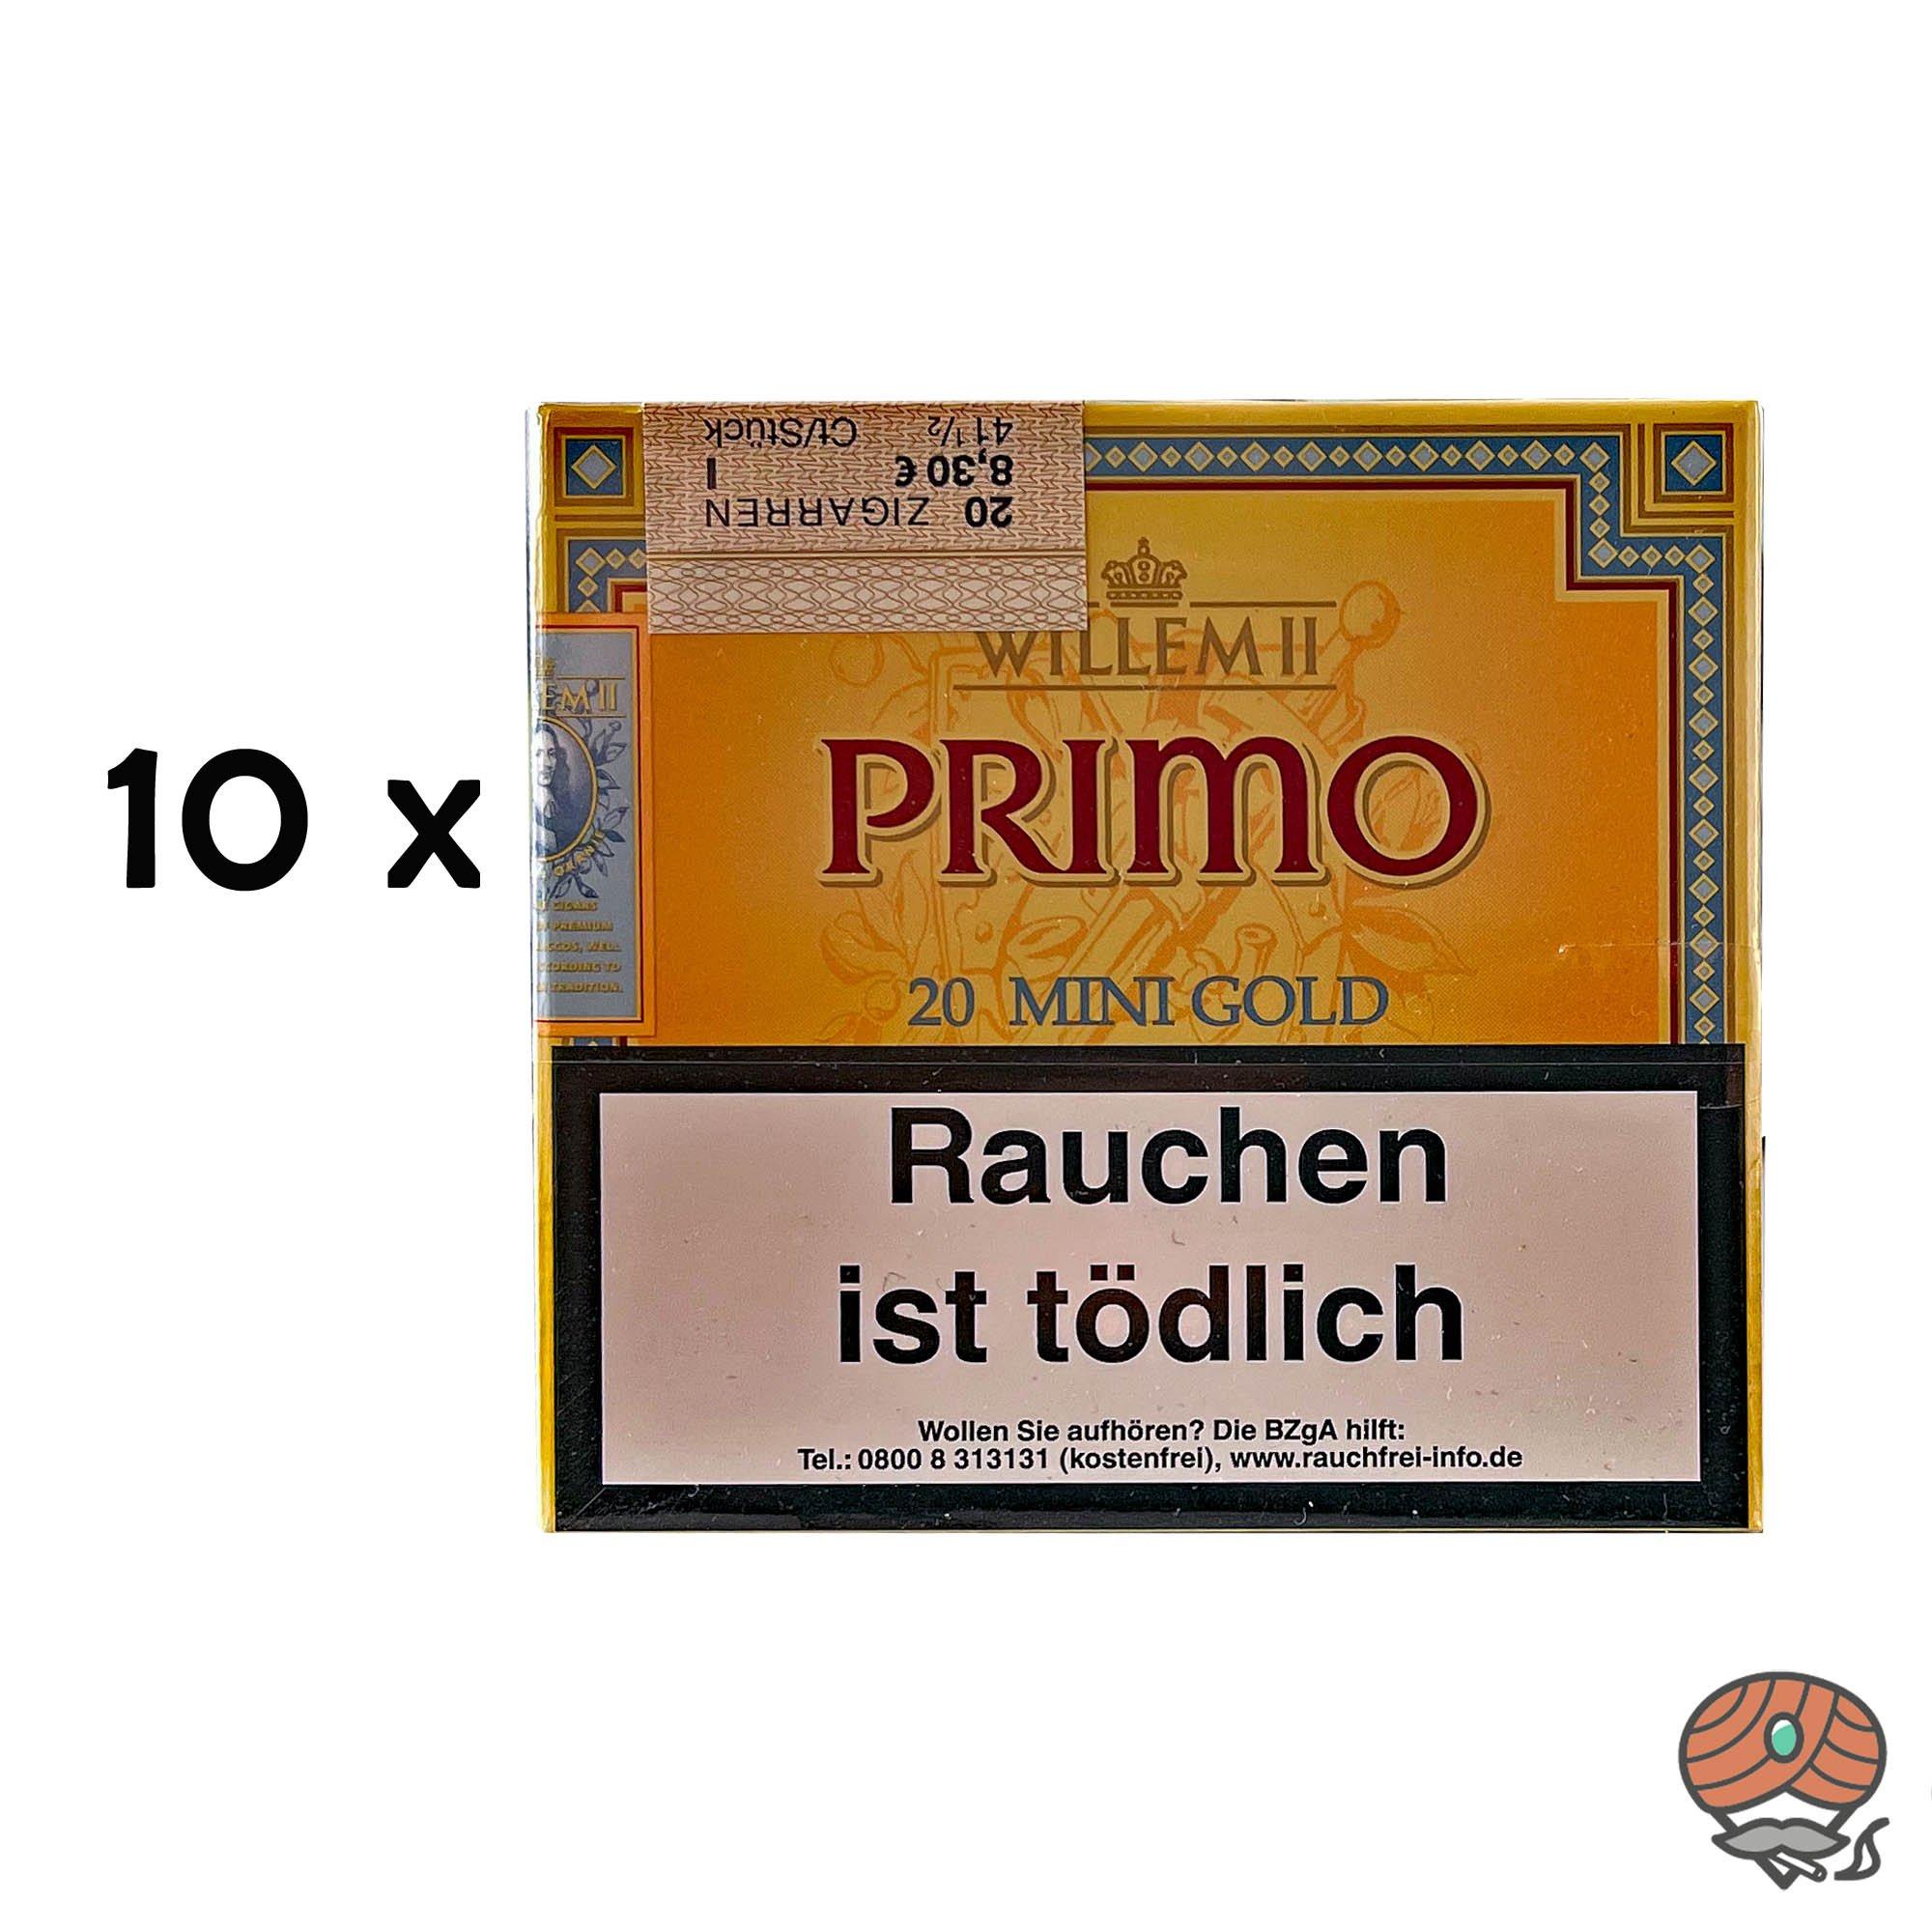 10 Schachteln Willem II Primo Mini Gold Zigarillos à 20 Stück